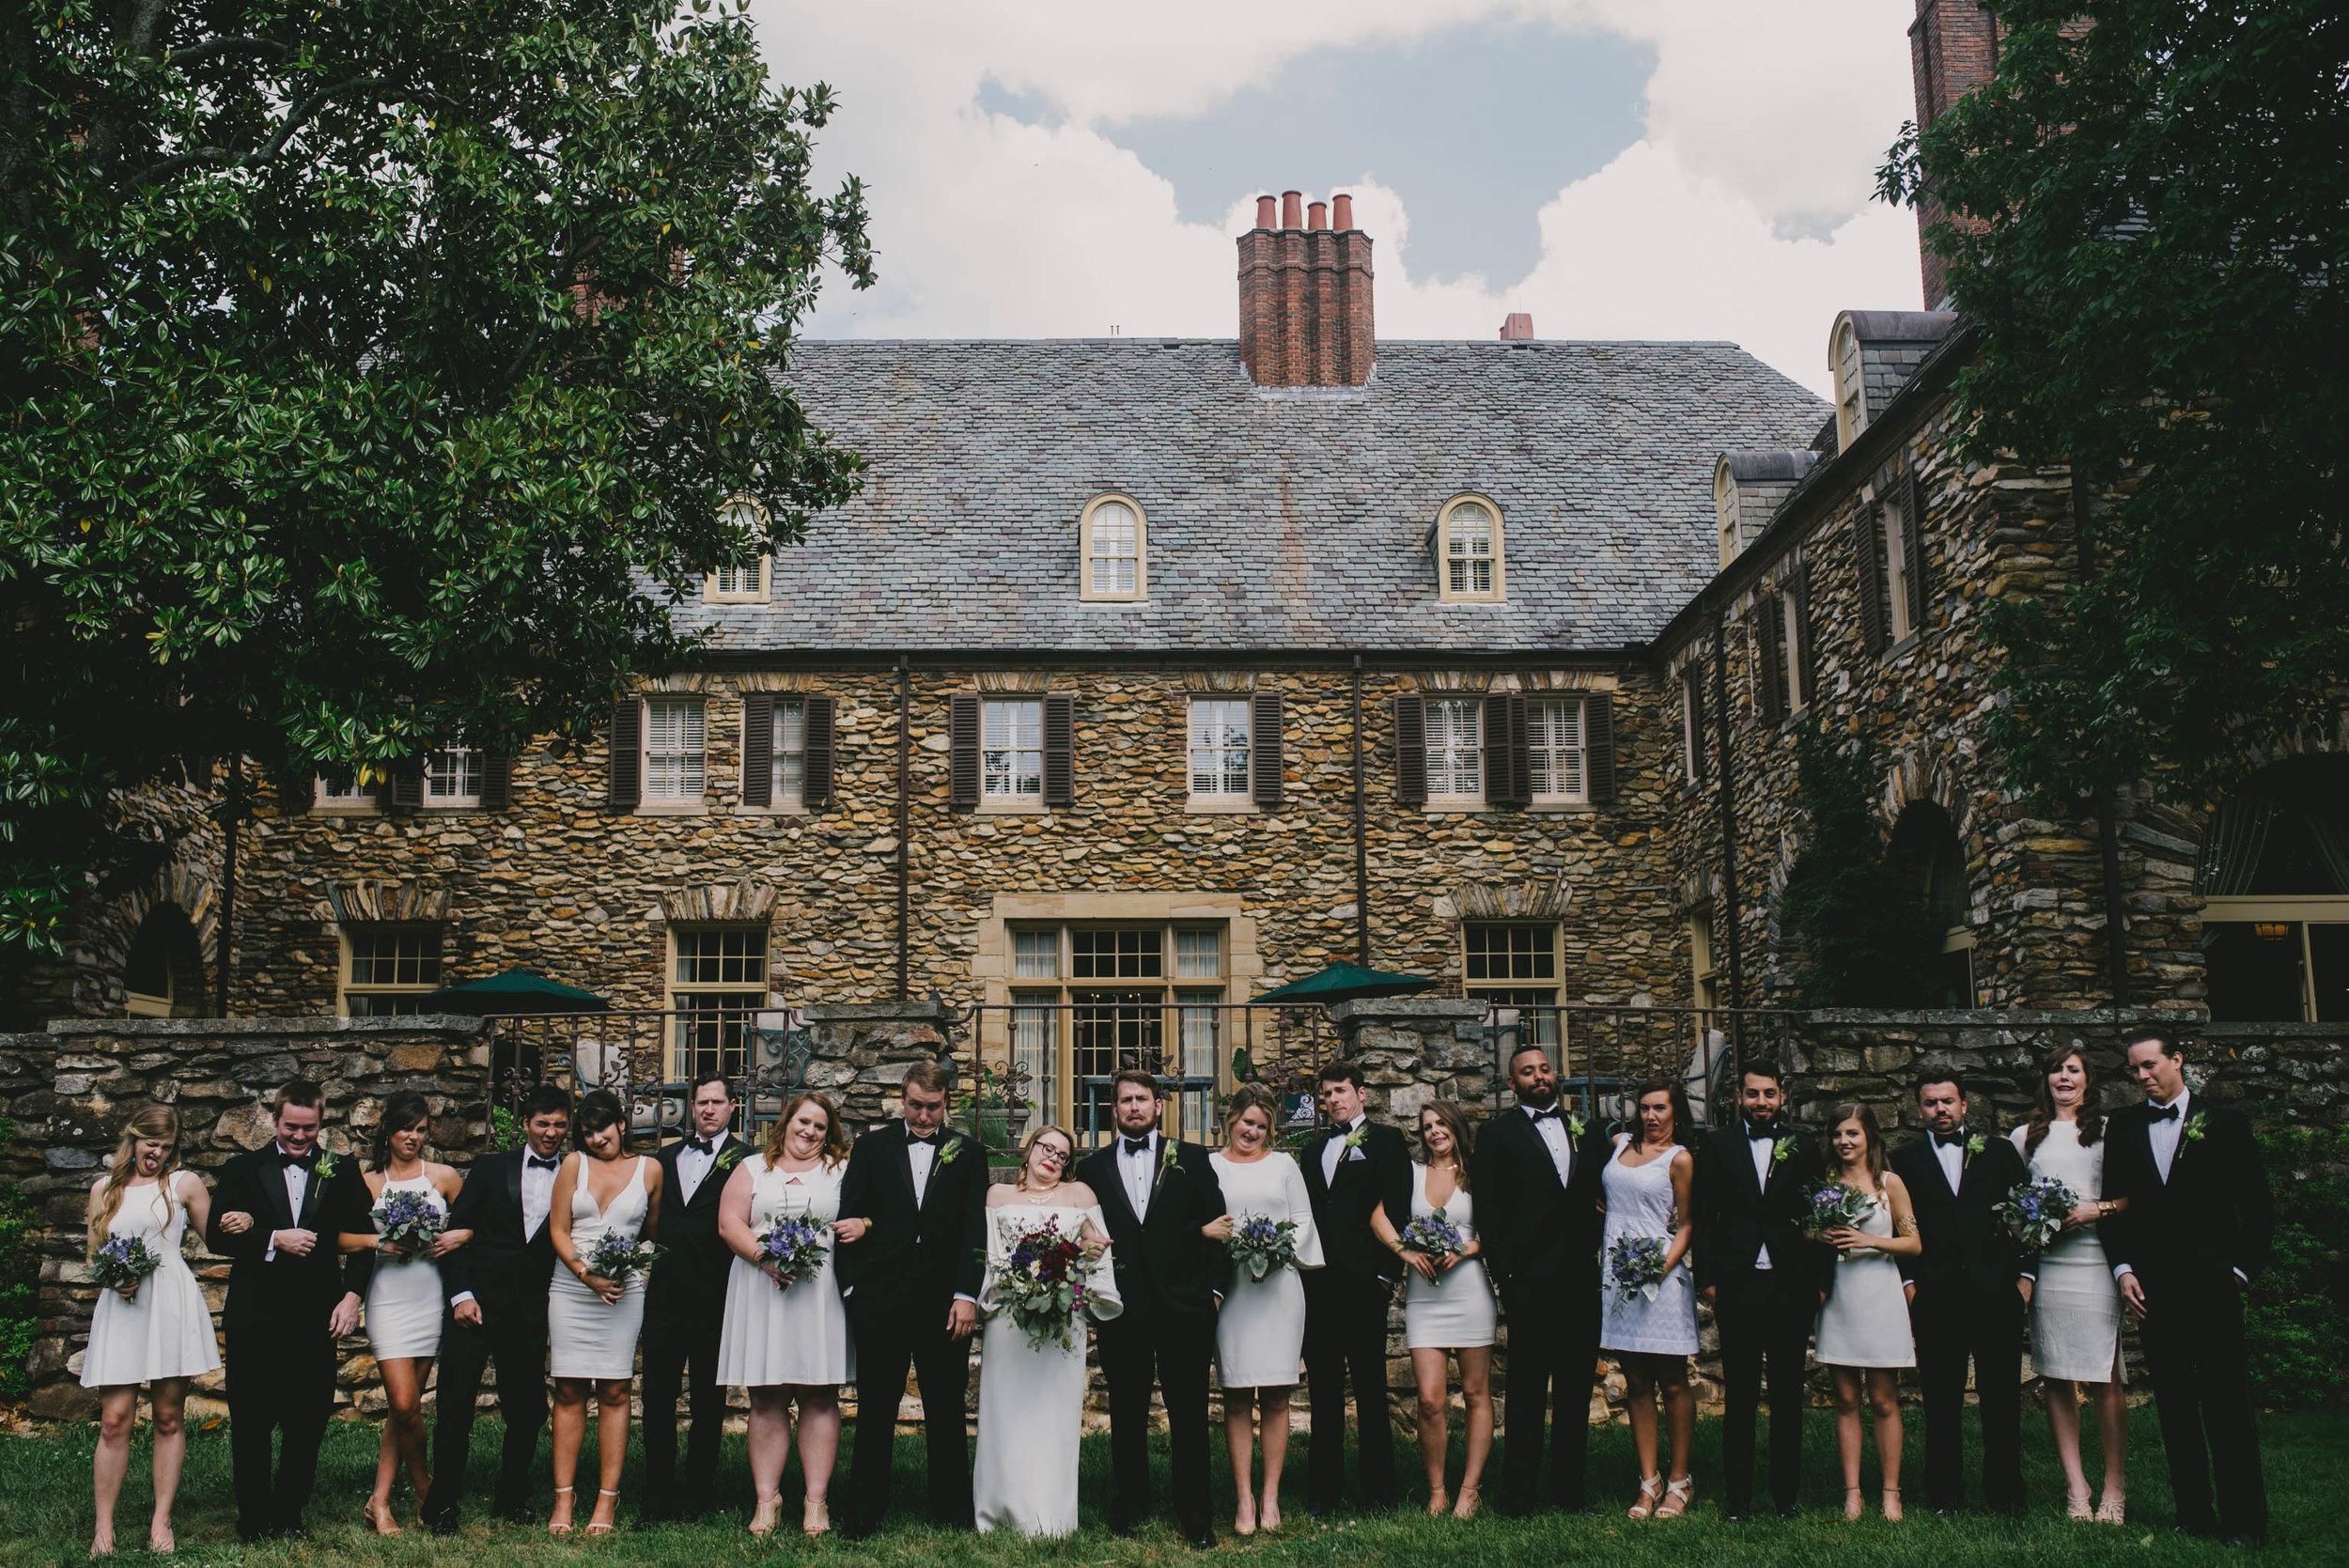 wedding-party-photos-at-the-graylyn.jpg